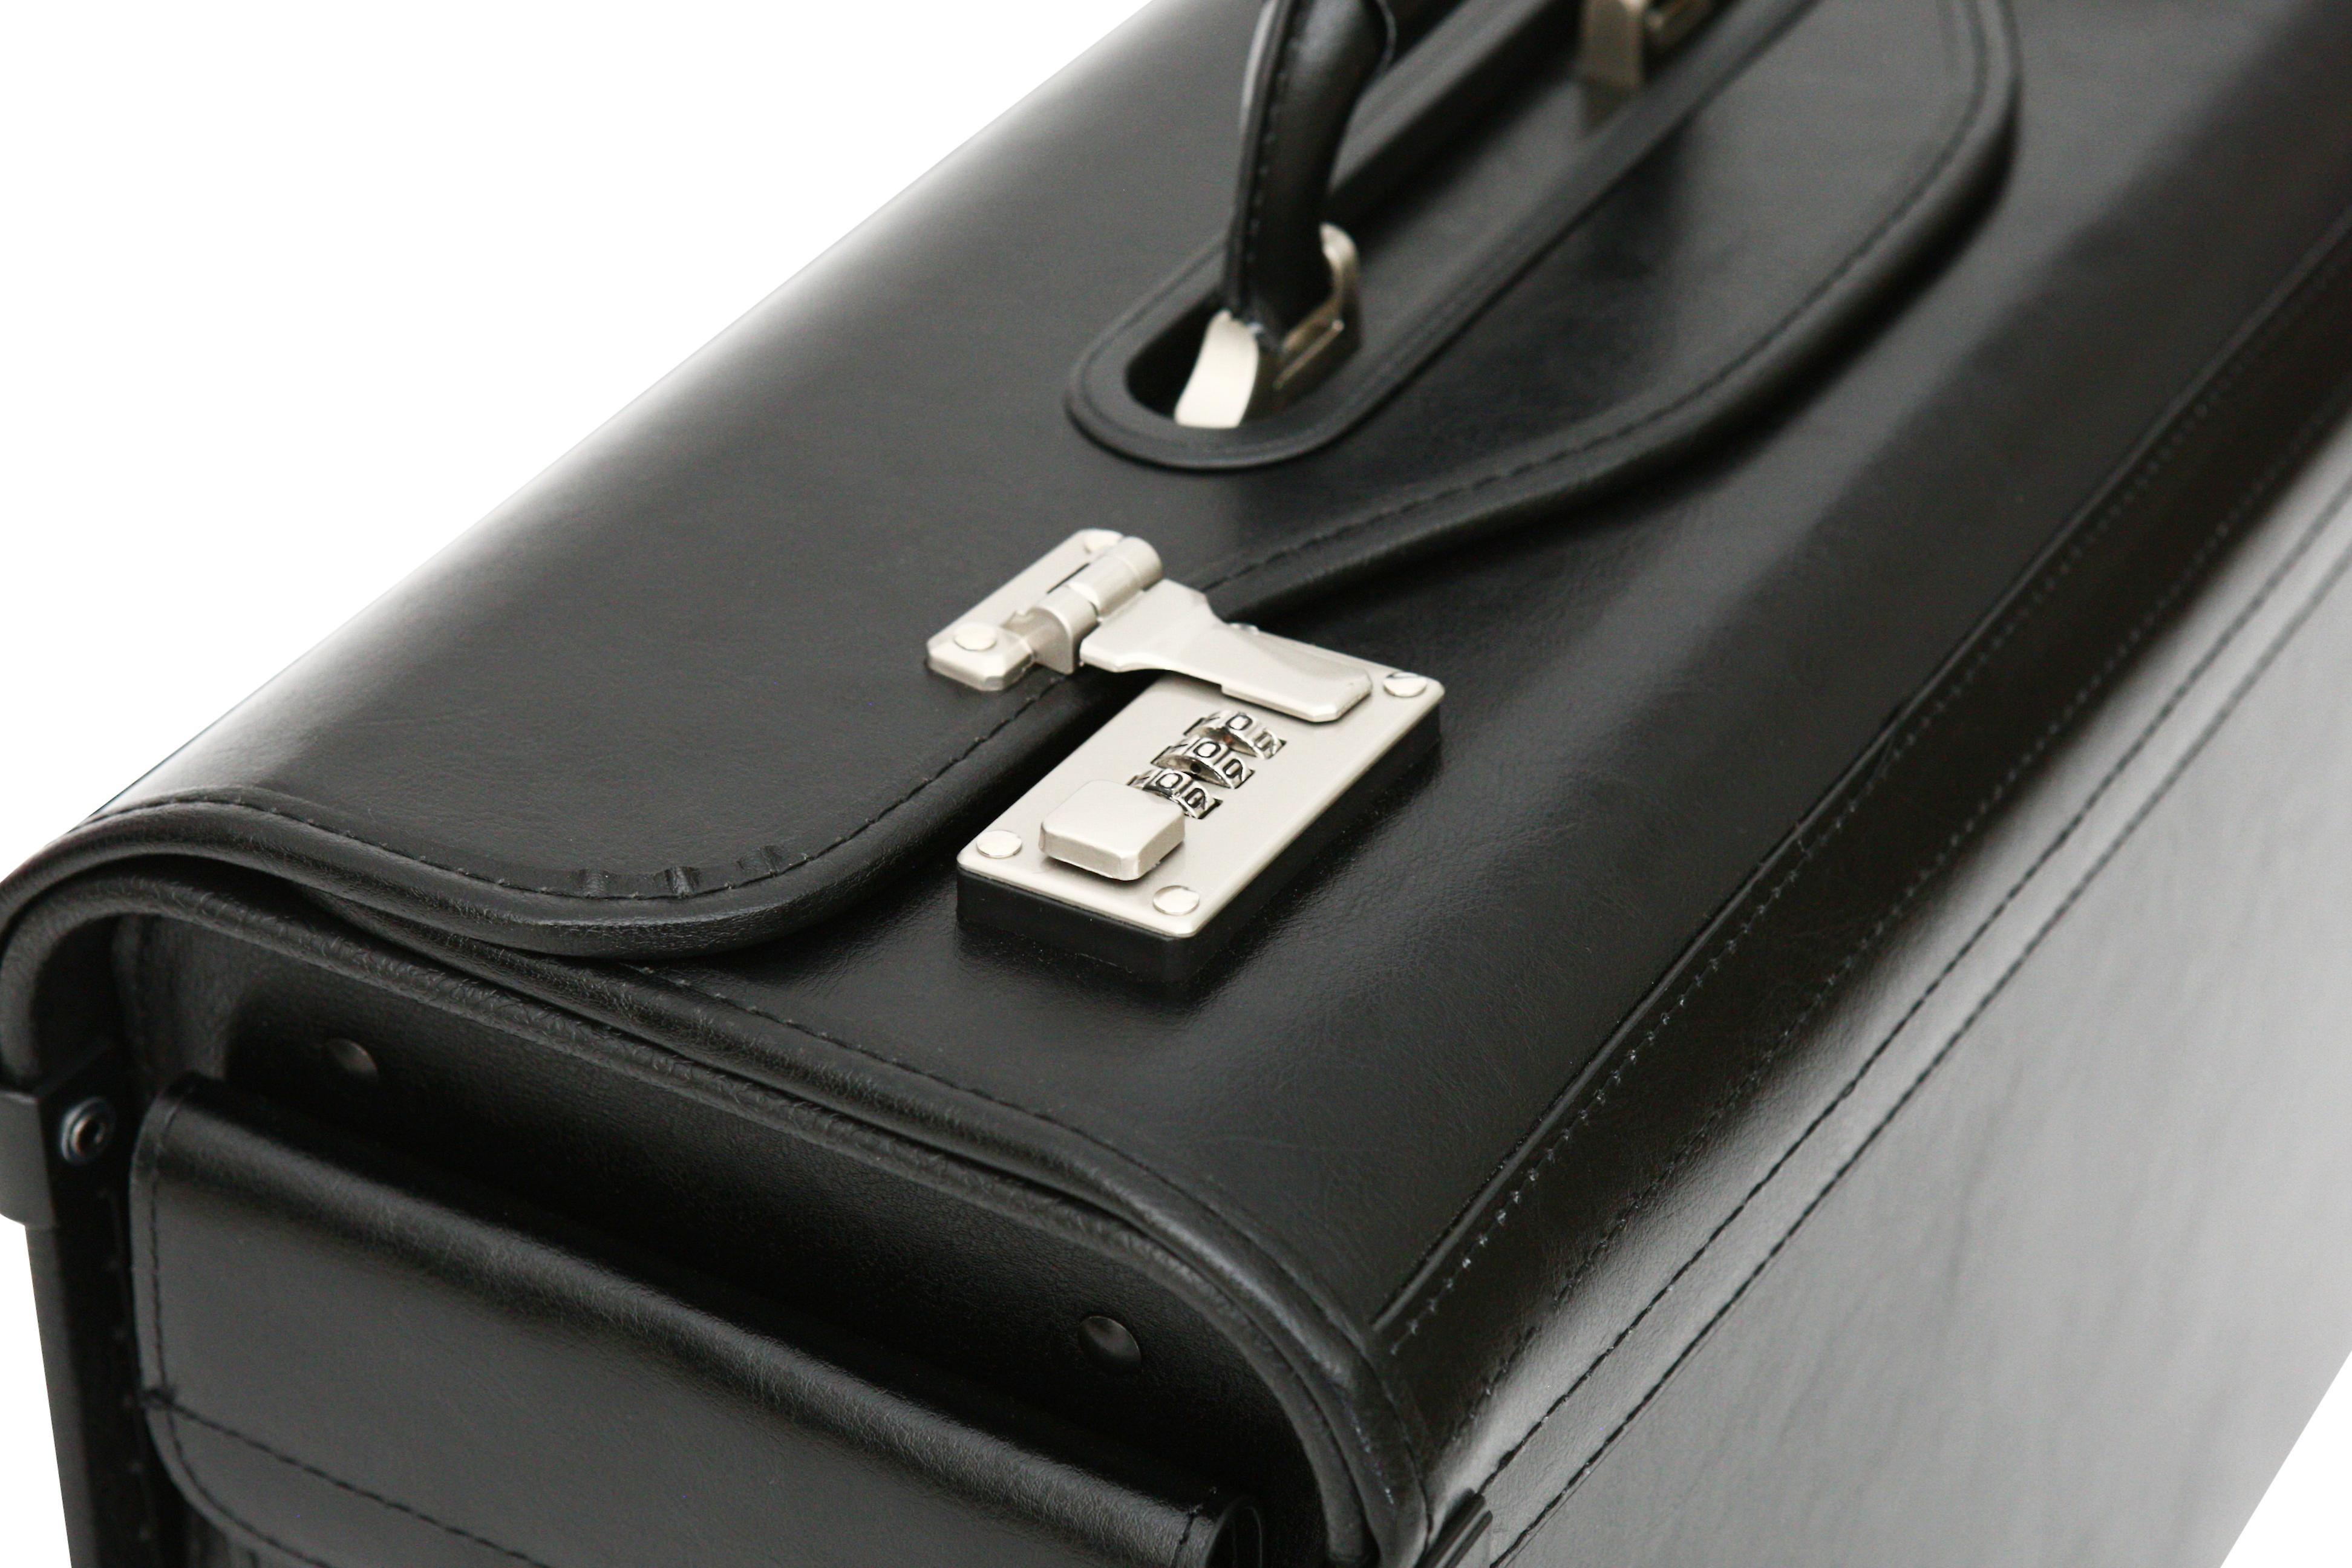 Bonded Leather Pilot Case Doctor Briefcase Hand Luggage Flight Cabin Business Bag